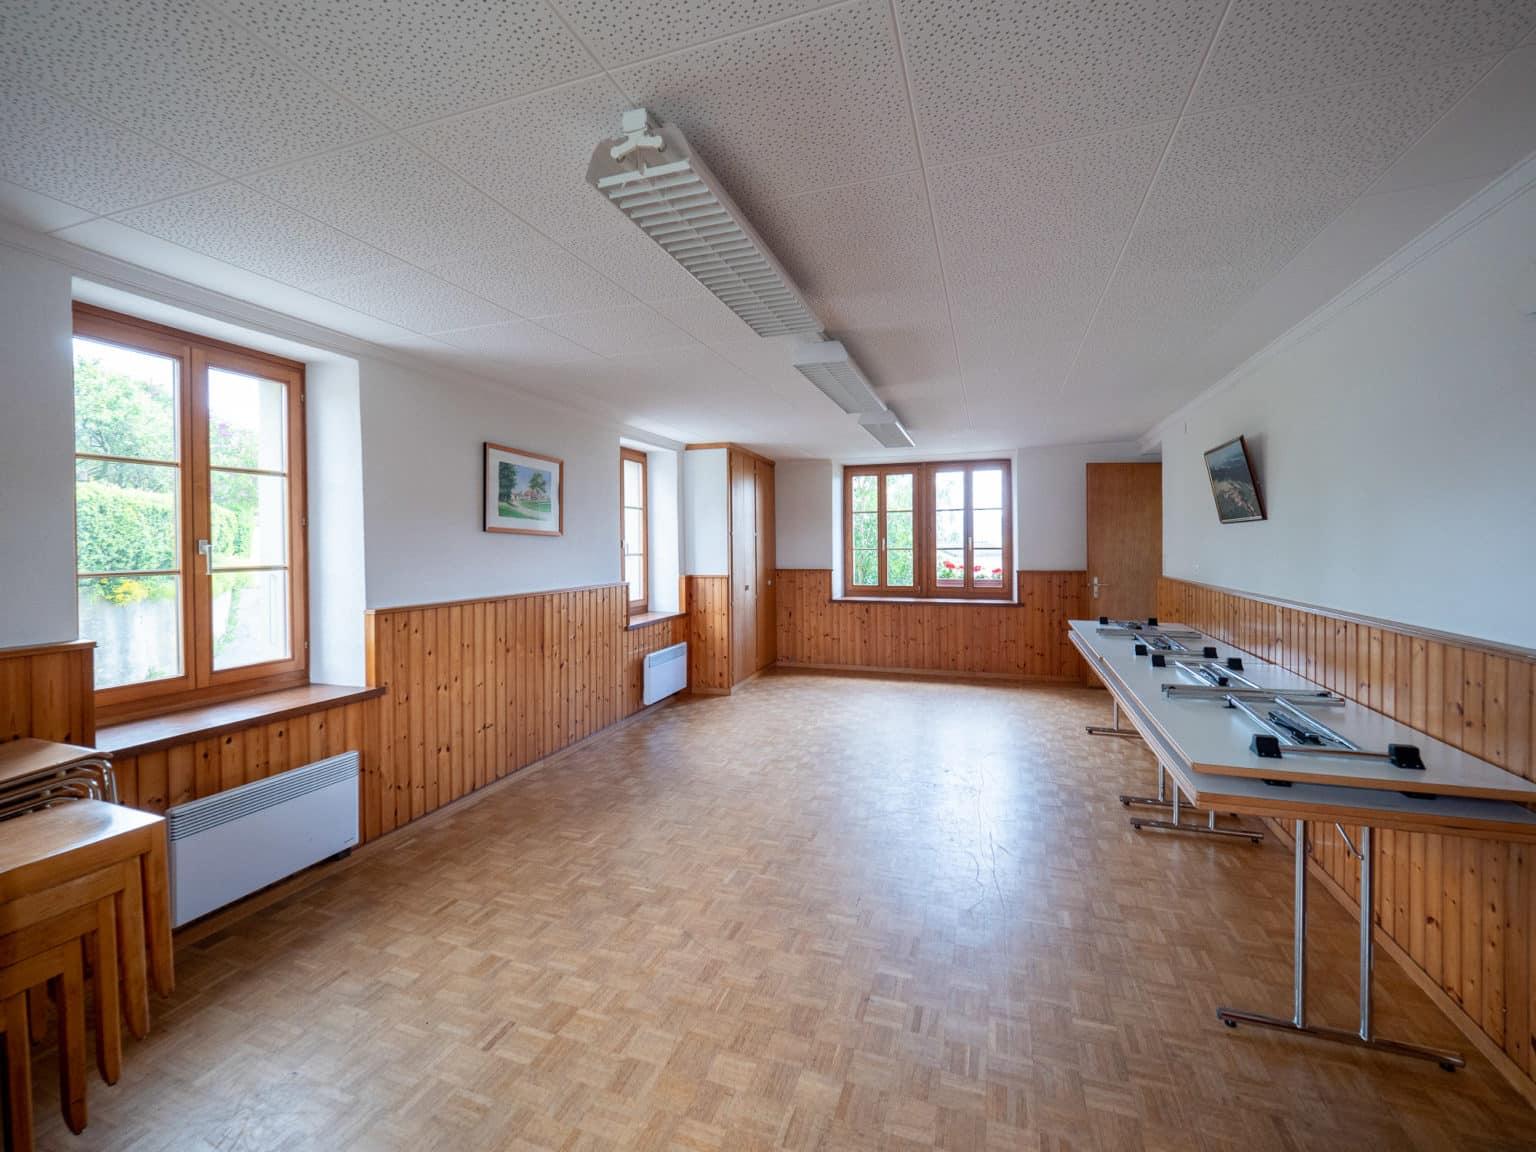 Refuges-salles-Montanaire©V-Dubach-52718